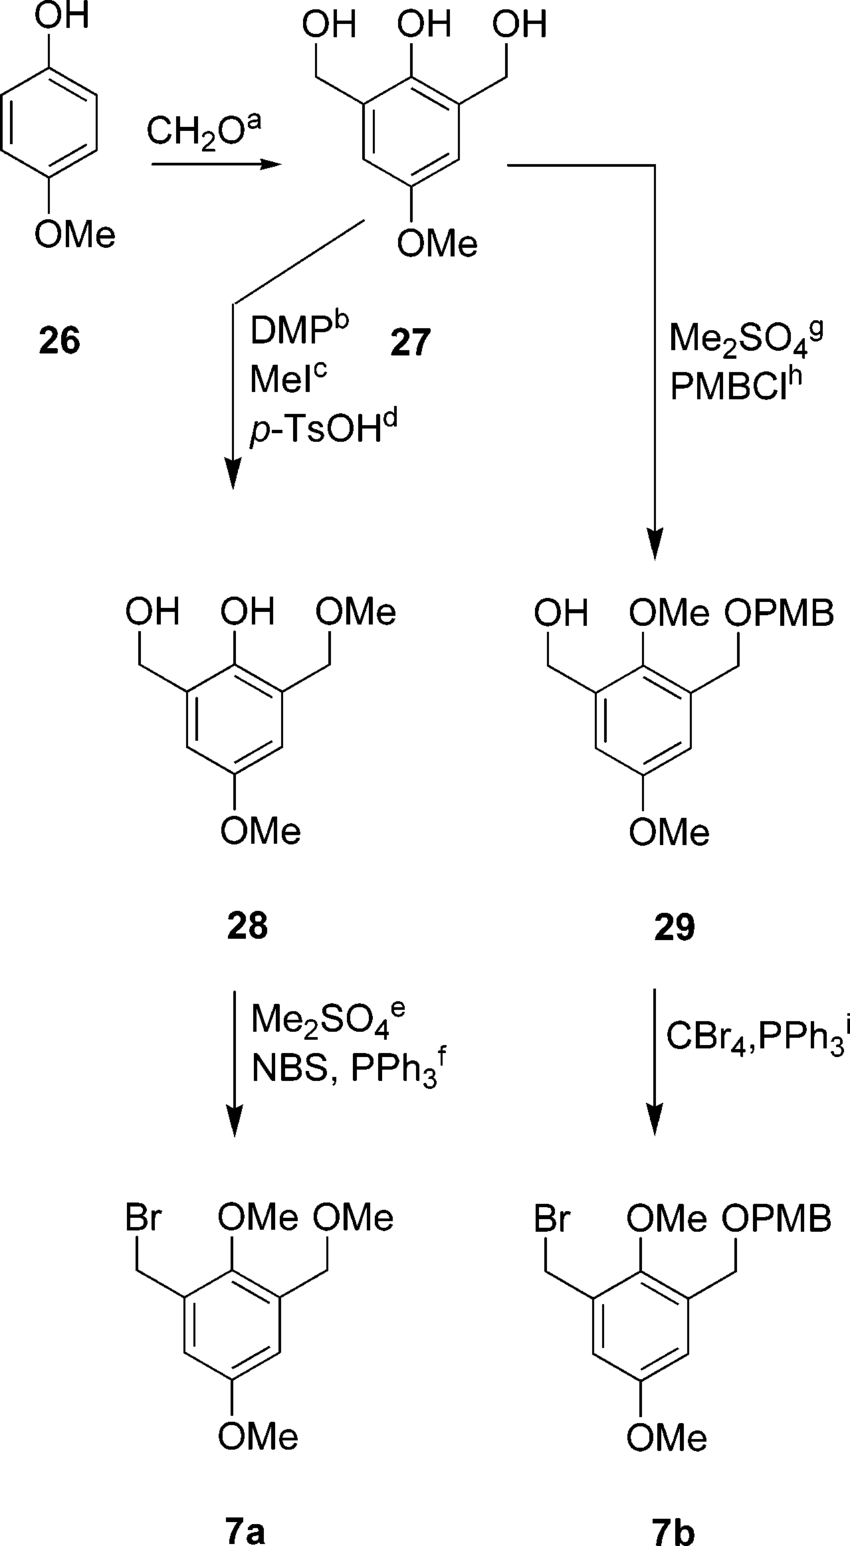 hight resolution of lewi diagram cbr4